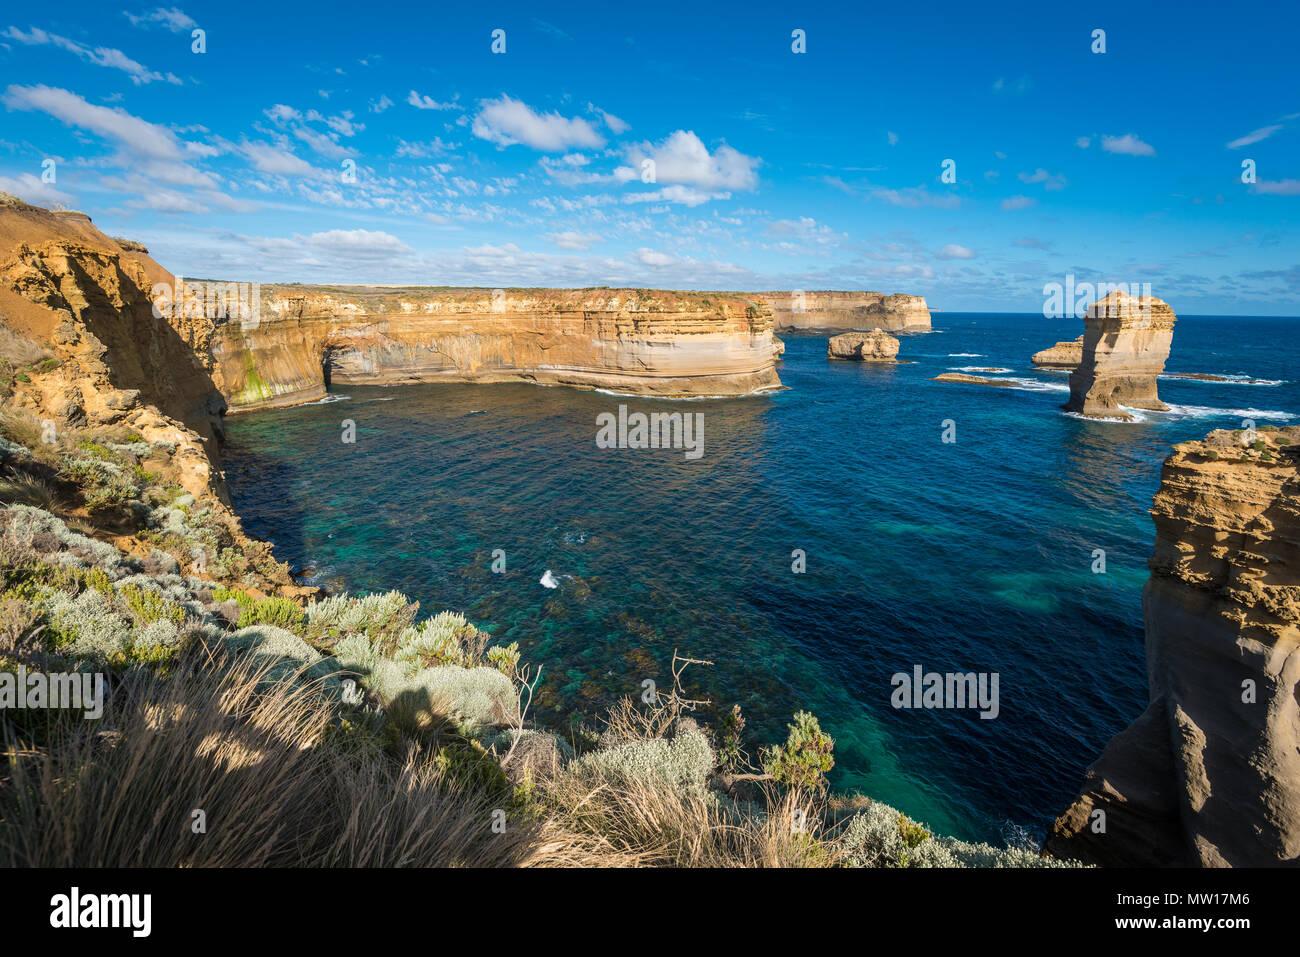 Razorback, une formation rocheuse de calcaire naturel, Port Campbell National Park, Great Ocean Road, Victoria, Australie Photo Stock